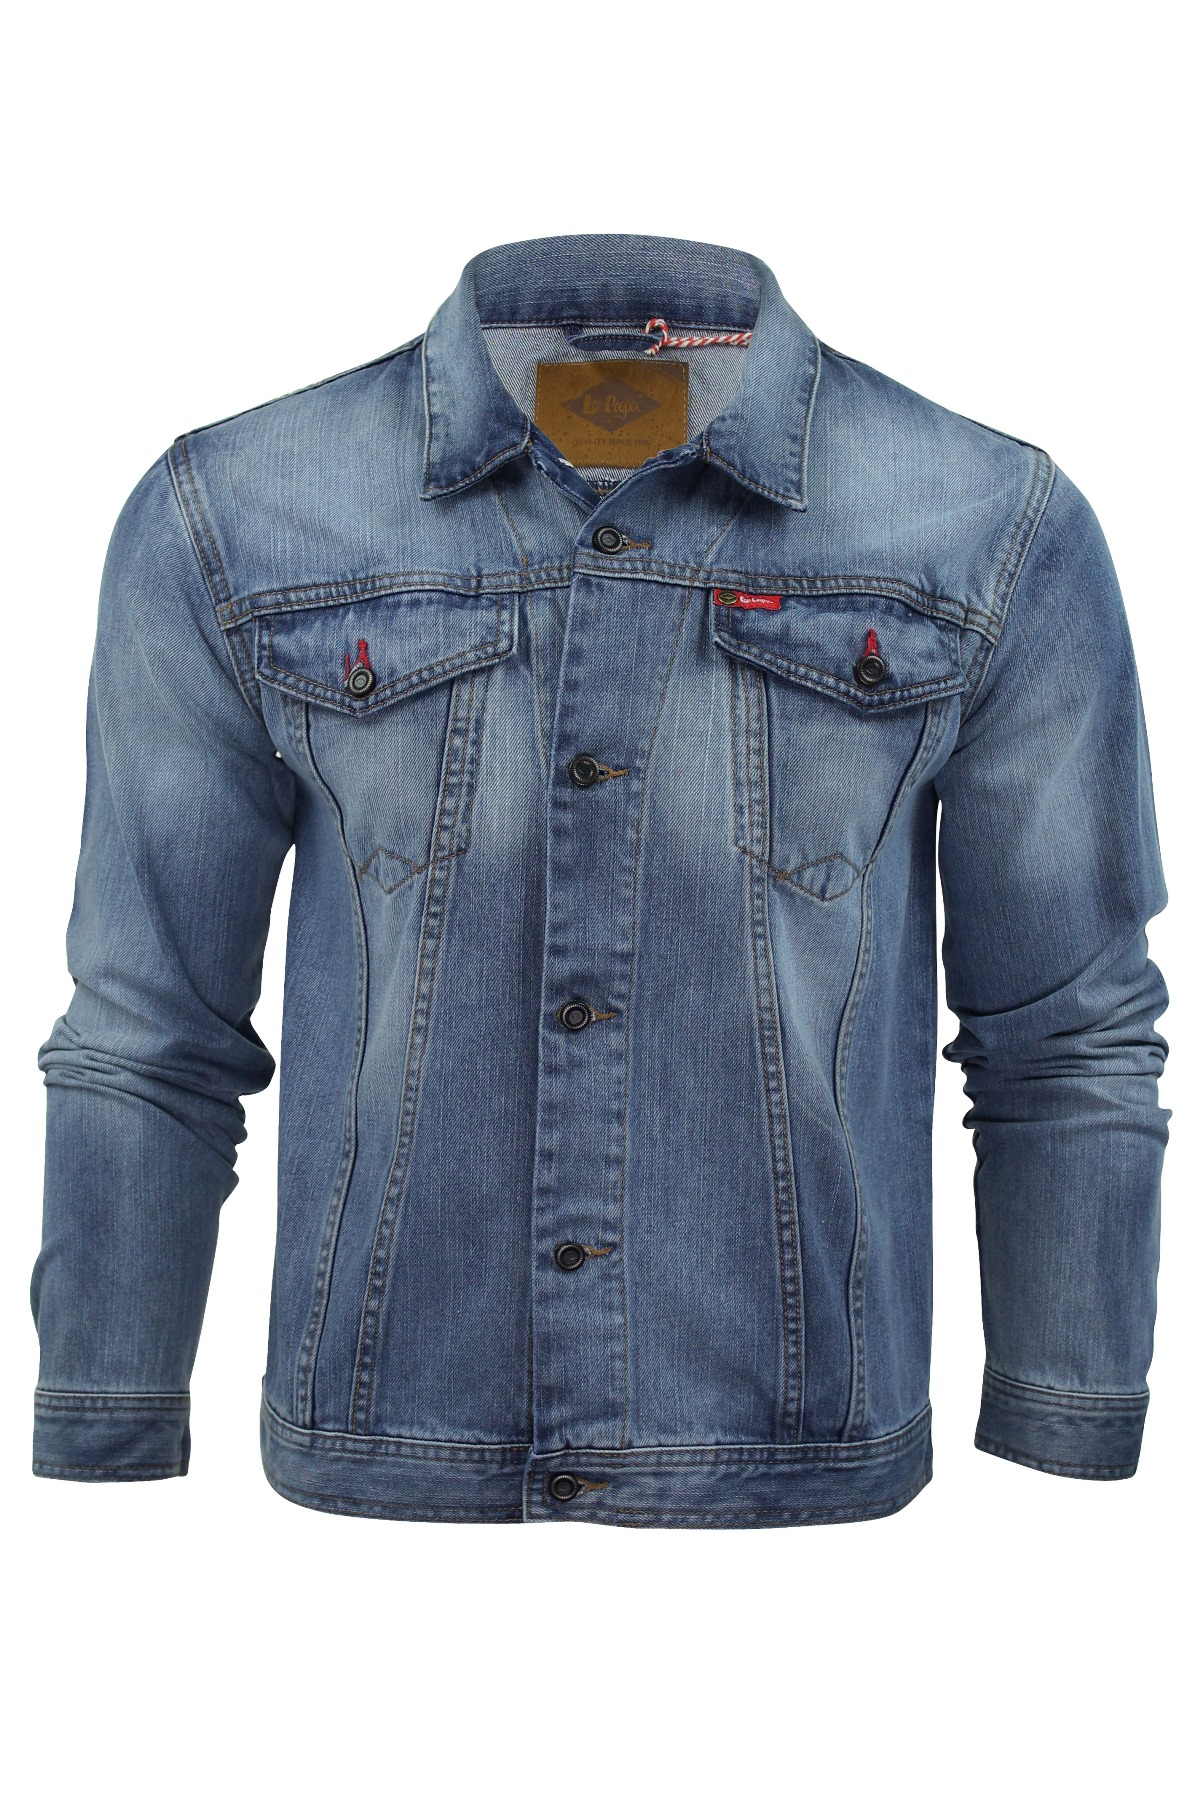 Mens Denim Jacket Coat Lee Cooper Premium Range u0026#39;Berdenu0026#39; | eBay